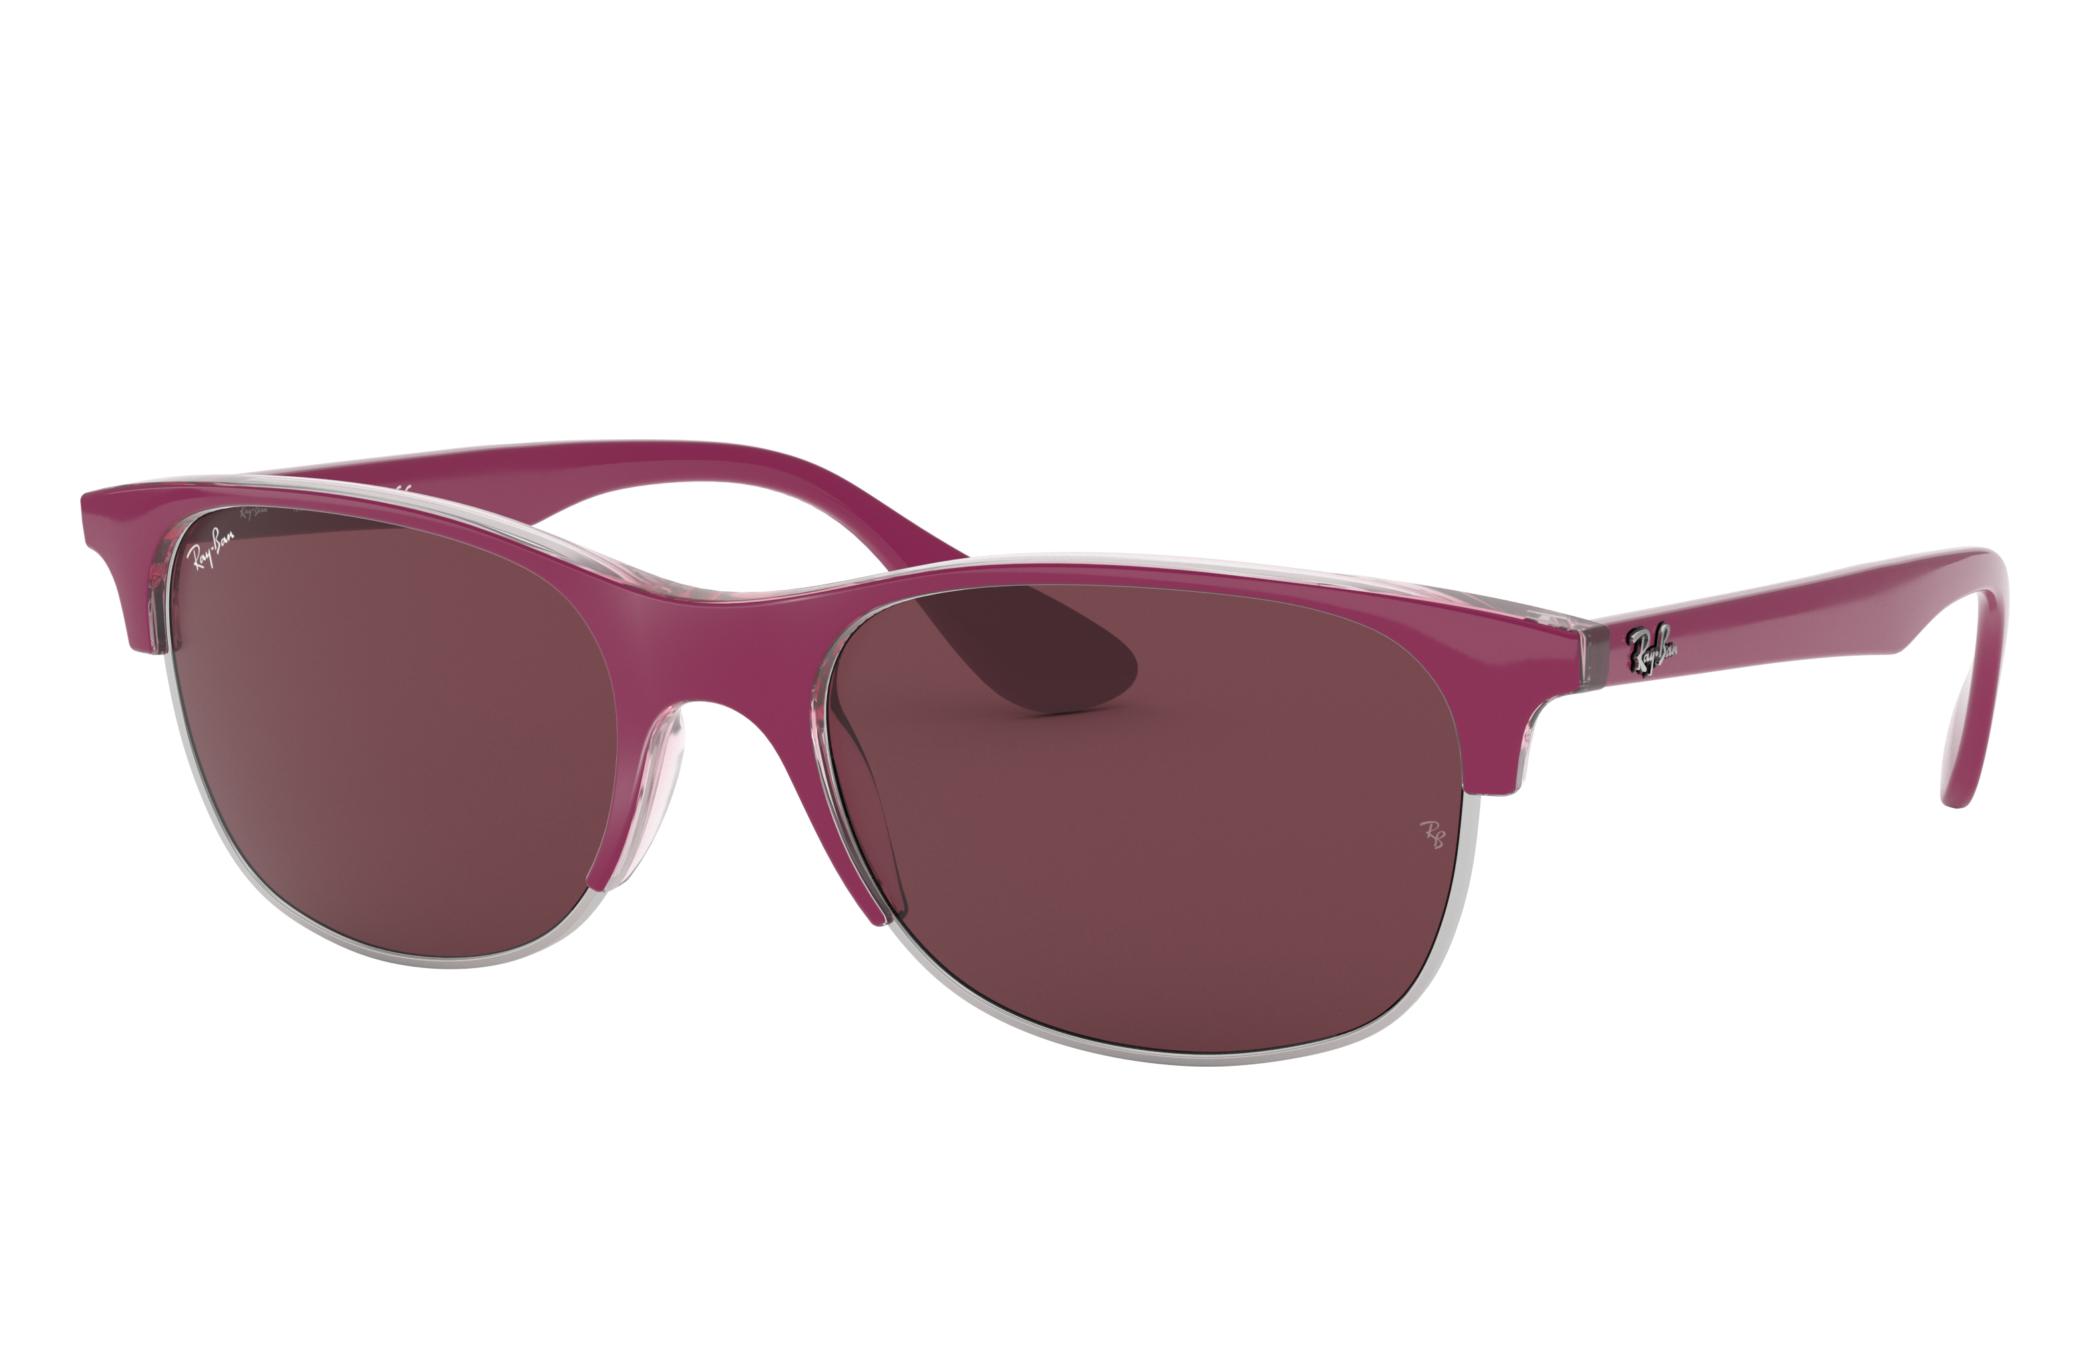 Ray-Ban Rb4319 Pink, Violet Lenses - RB4319